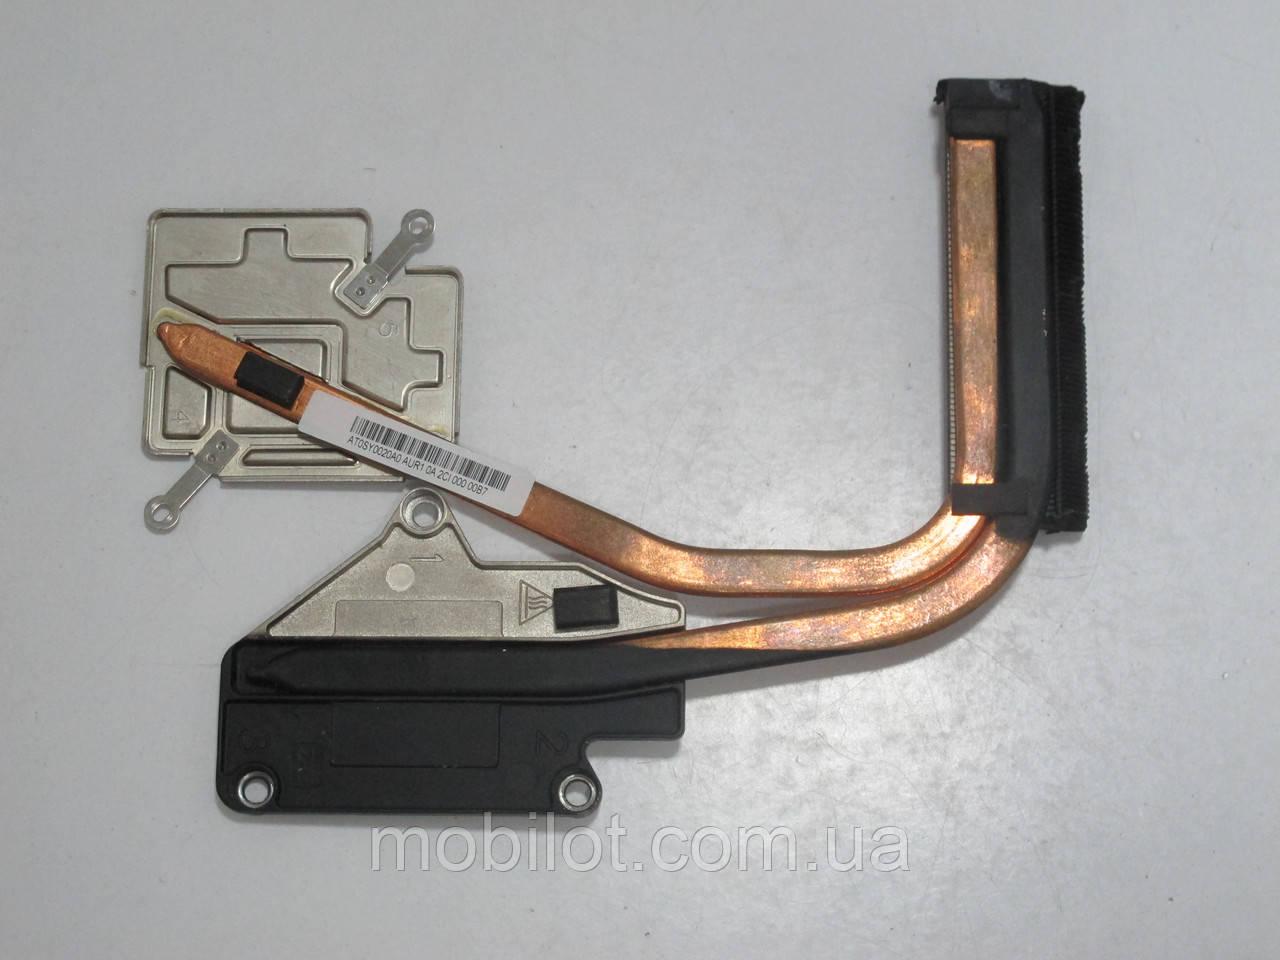 Система охлаждения Lenovo Z500 (NZ-6677)